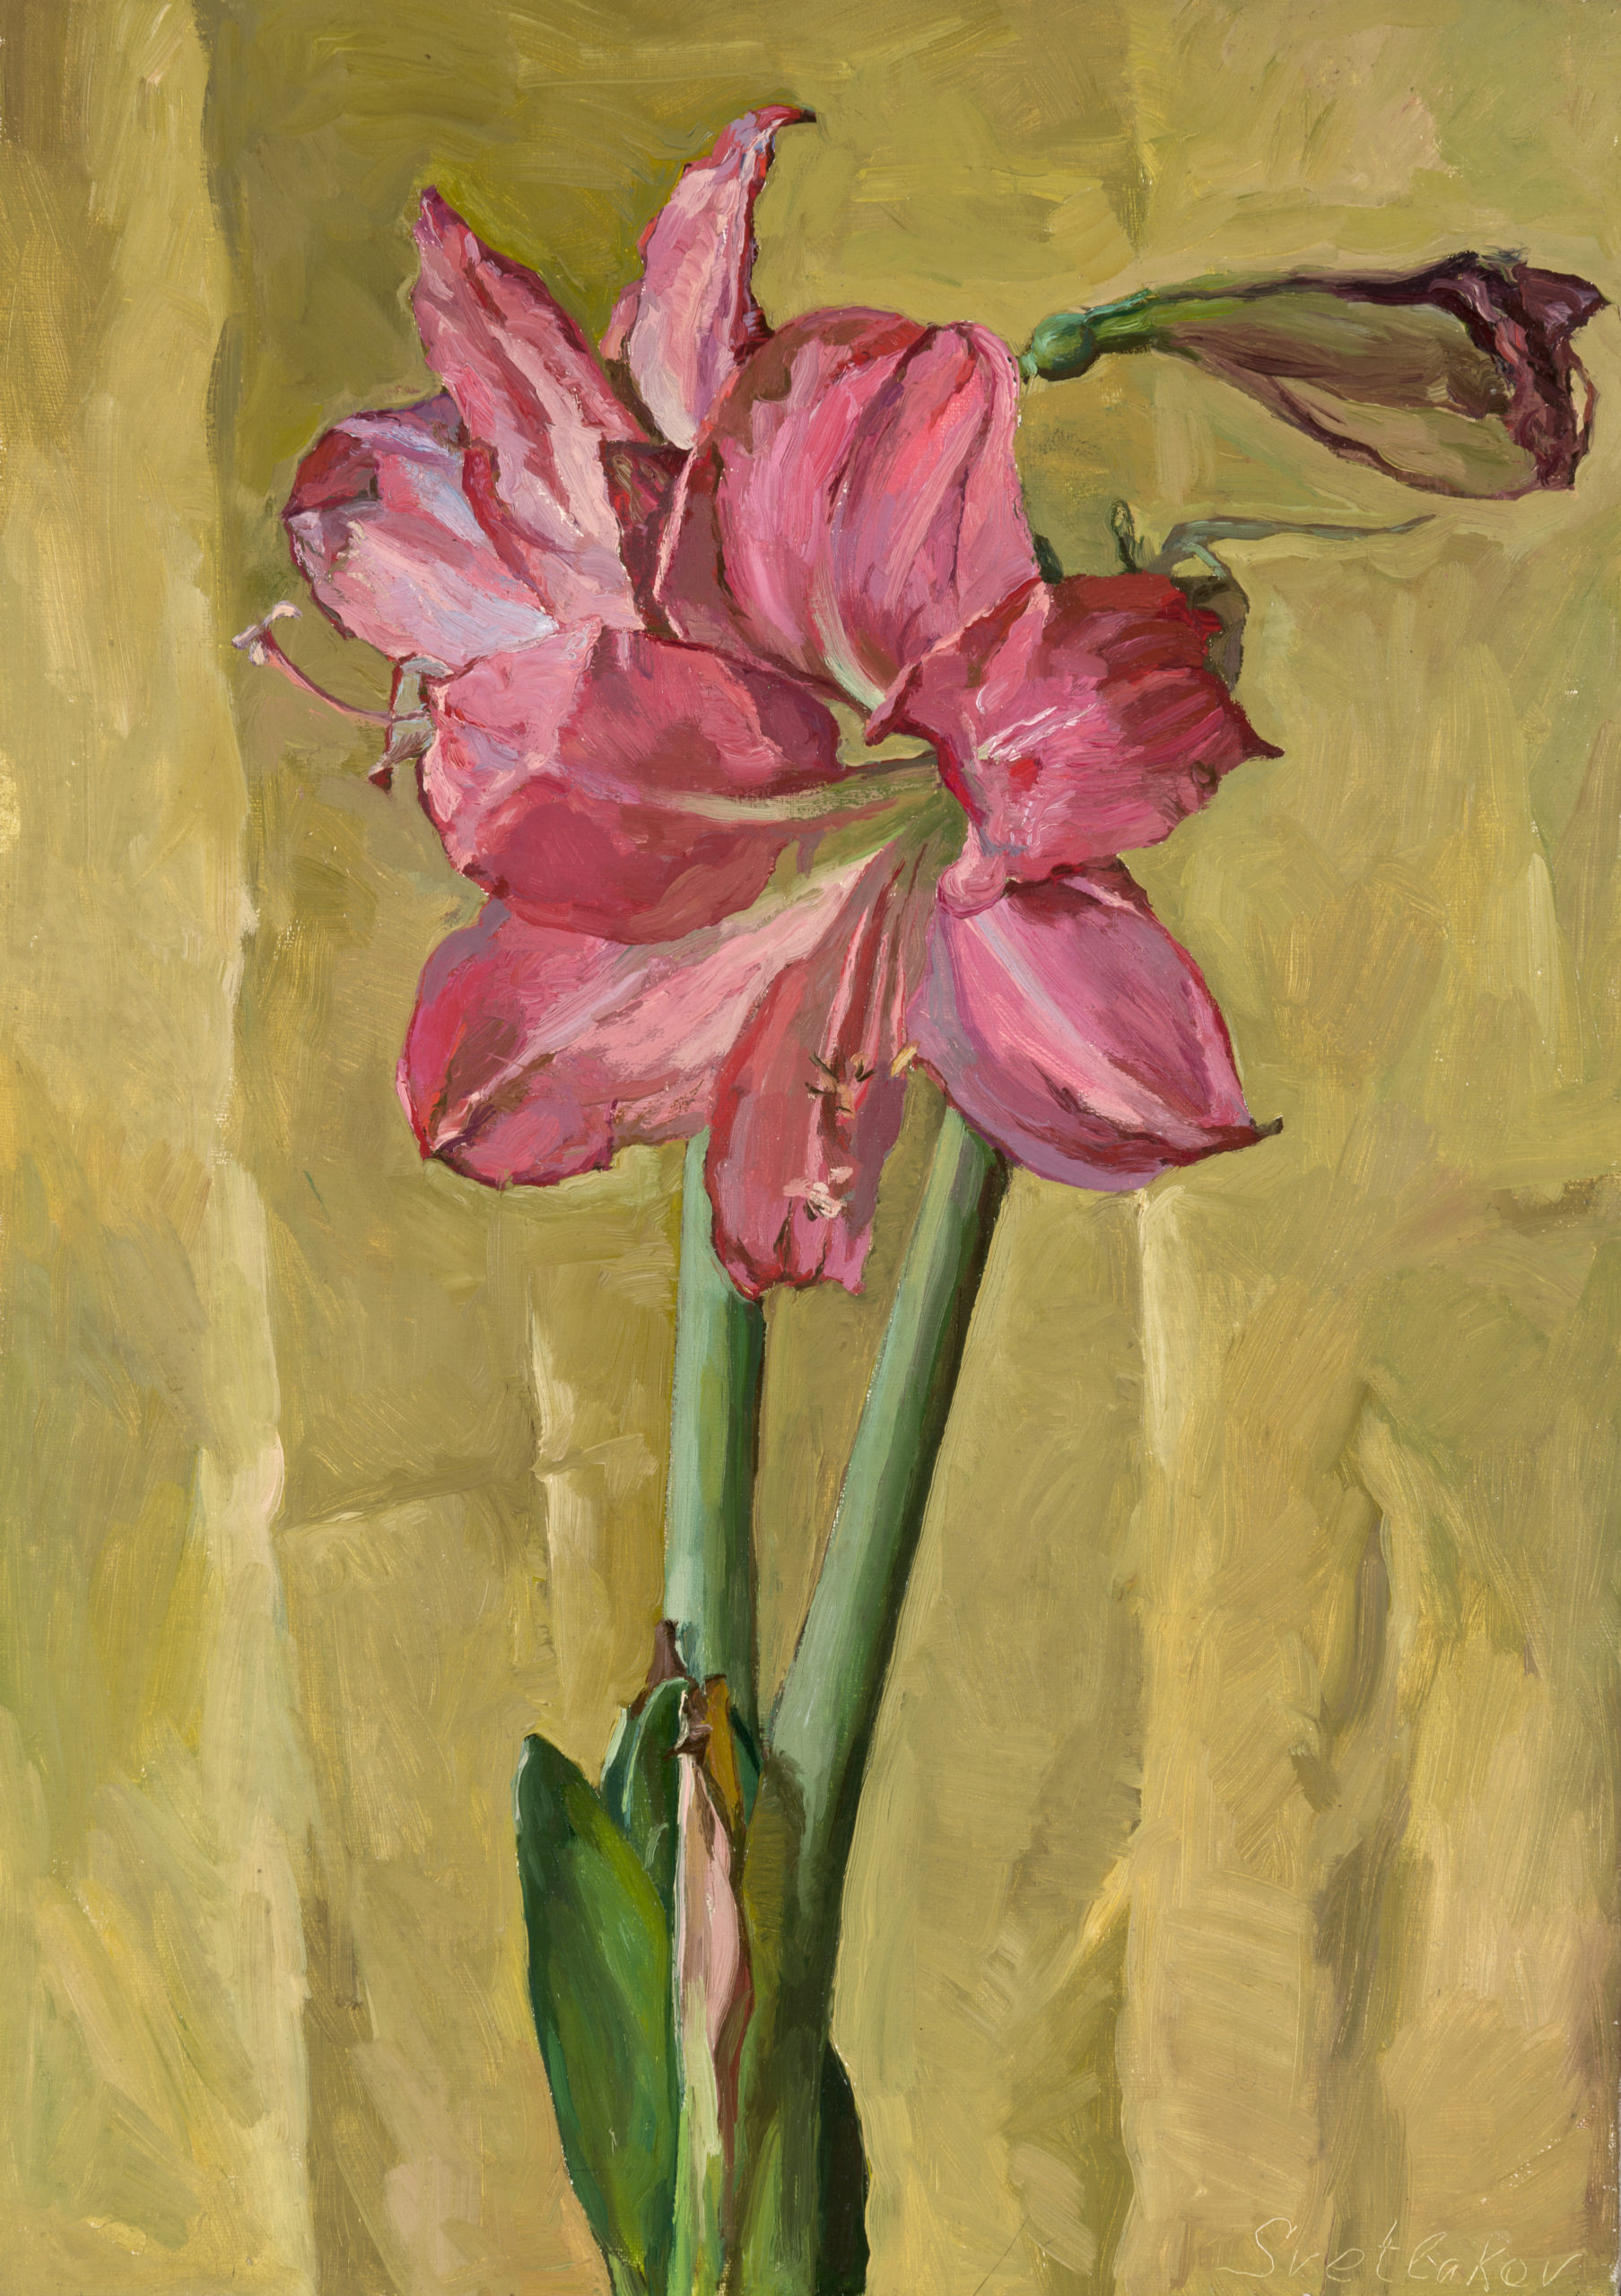 Pink Amaryllis: oil on canvas, 51x35 cm.